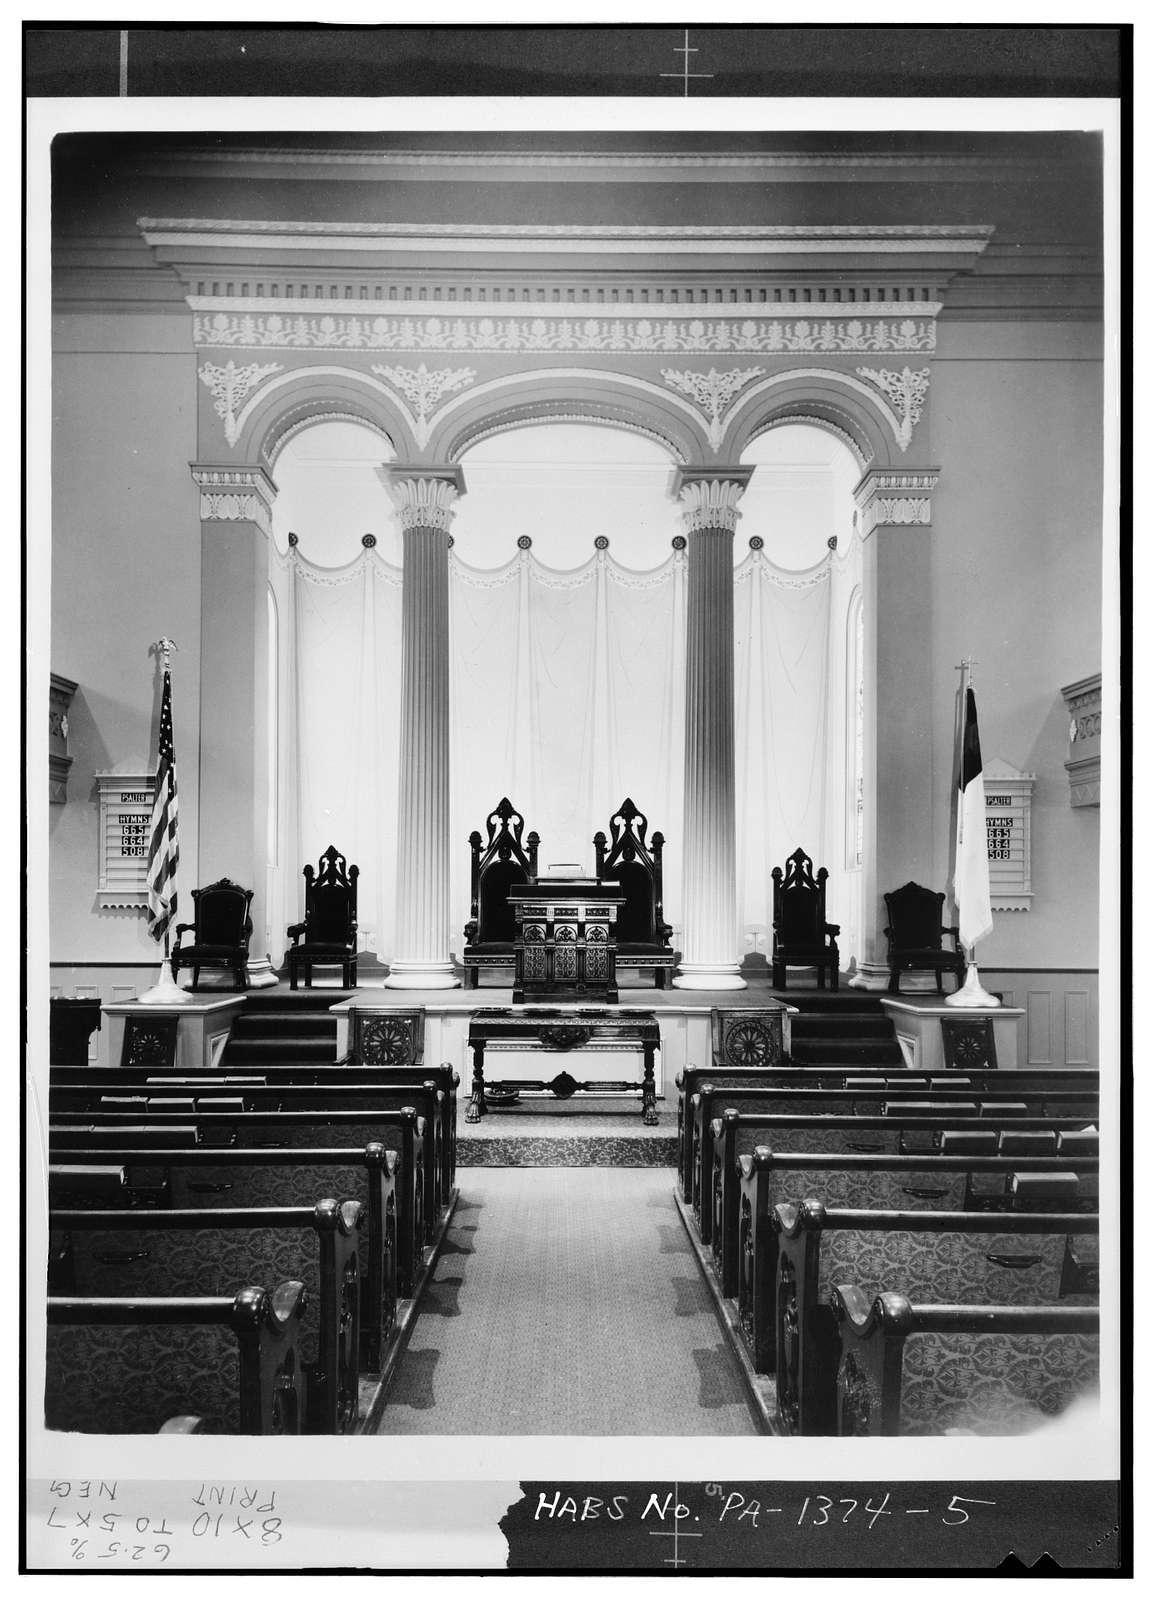 Third Presbyterian Church, 422 Pine Street, Philadelphia, Philadelphia County, PA